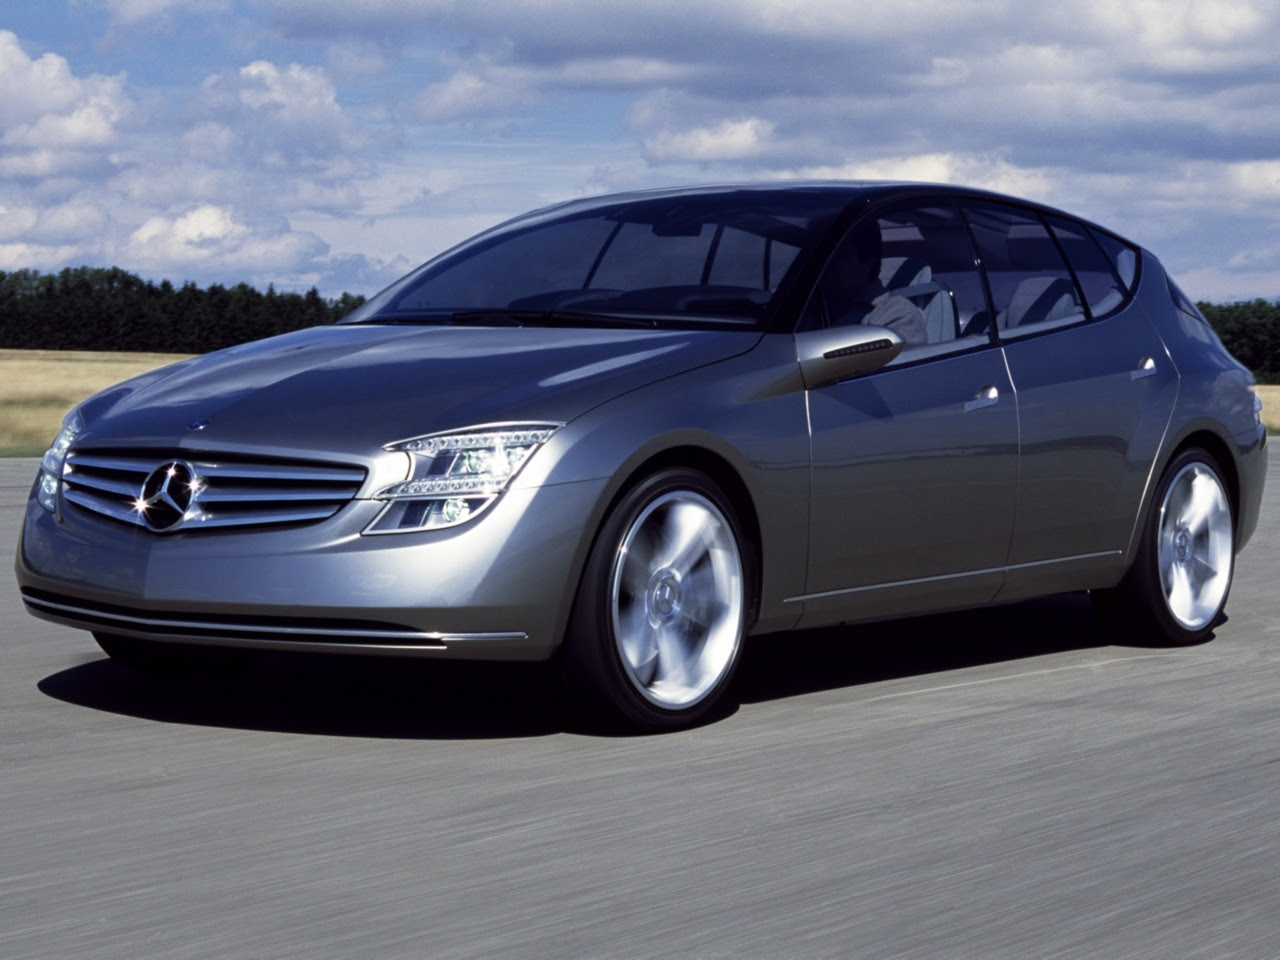 Mercedes-Benz F500 Mind Concept (2003) - Old Concept Cars